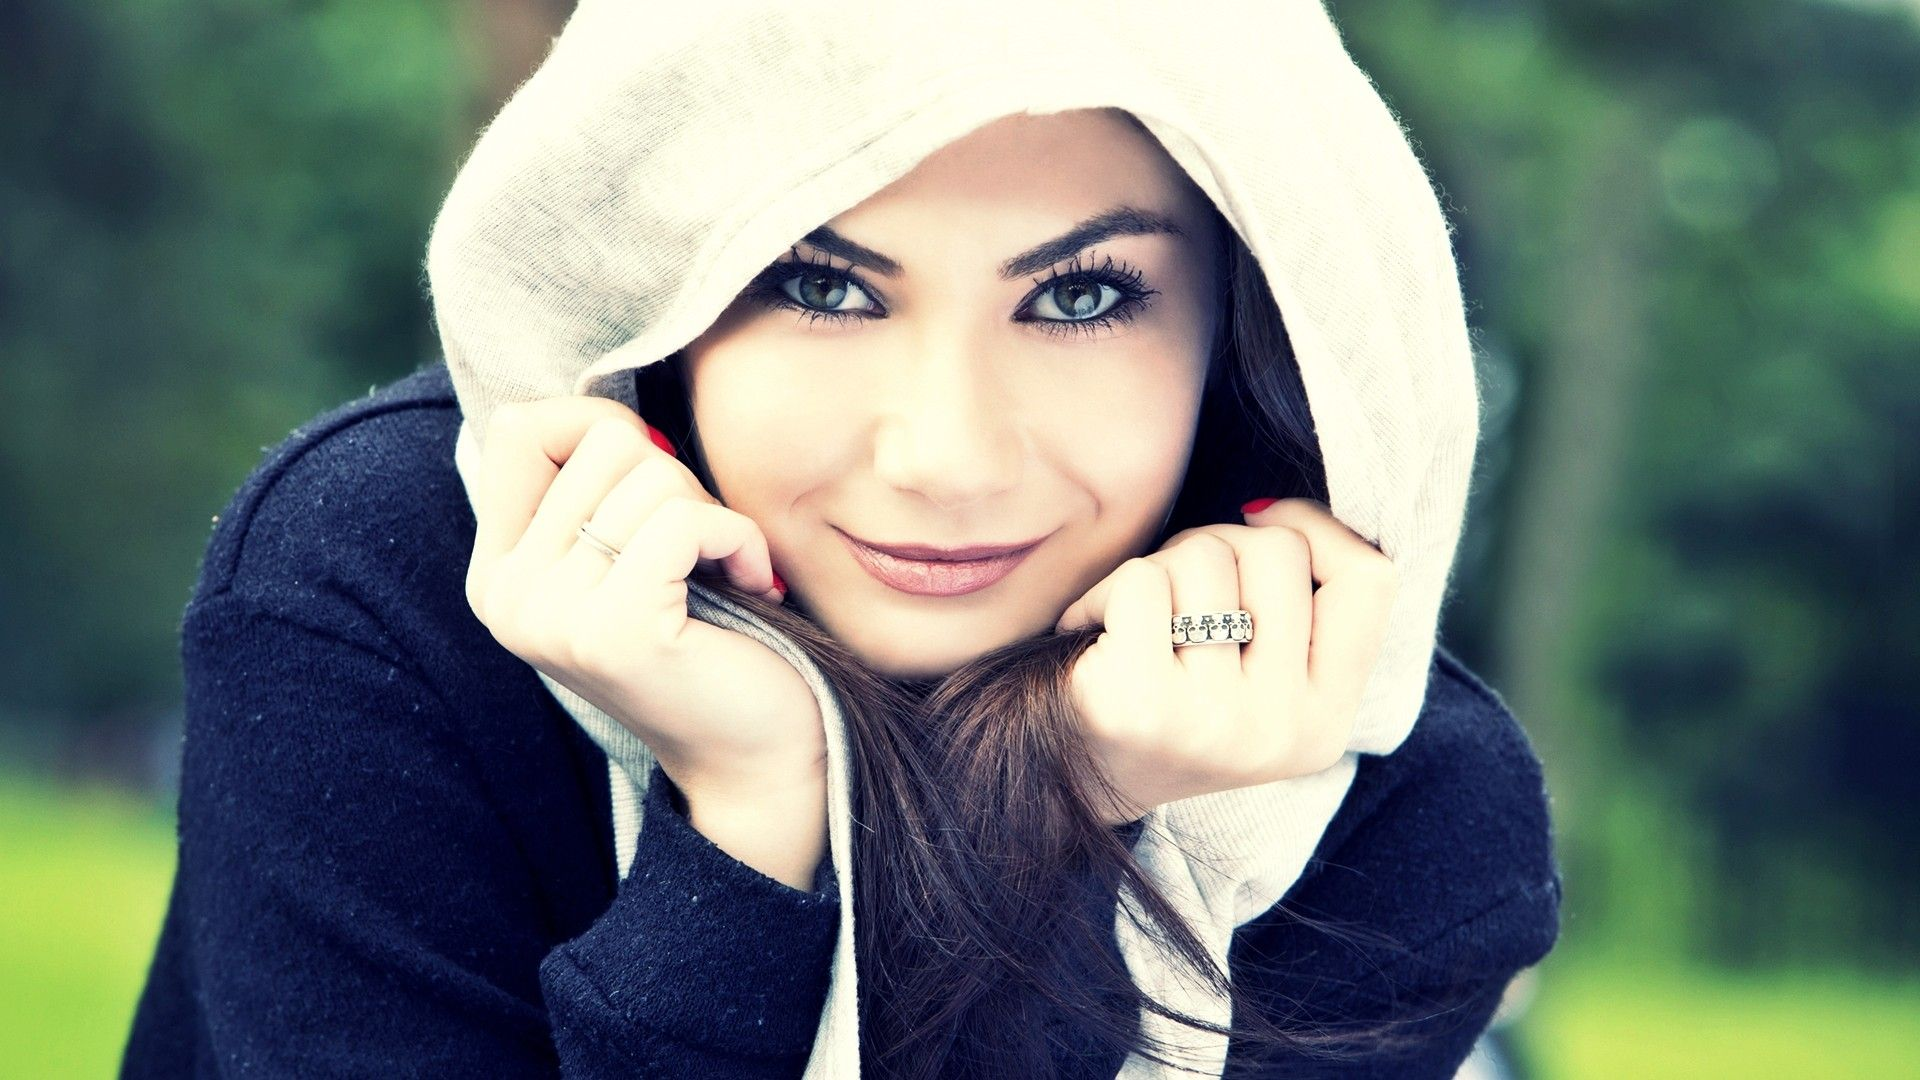 Hd wallpaper cute girl - Cute Smiling Girl Face Hd 1080p Wallpapers Download